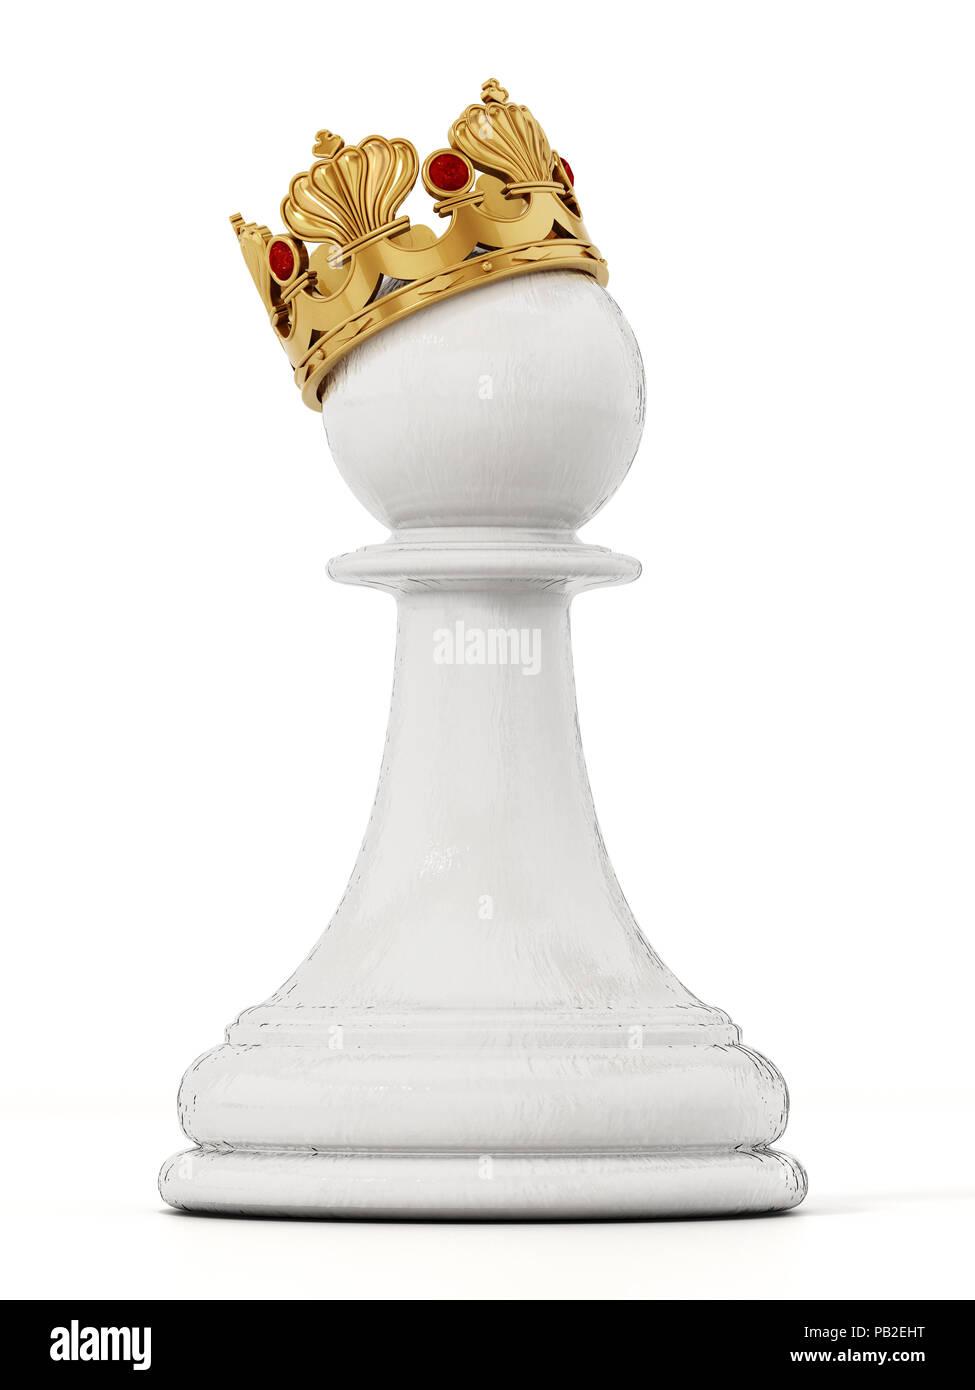 Peón blanco de ajedrez con corona de oro. Ilustración 3D. Imagen De Stock